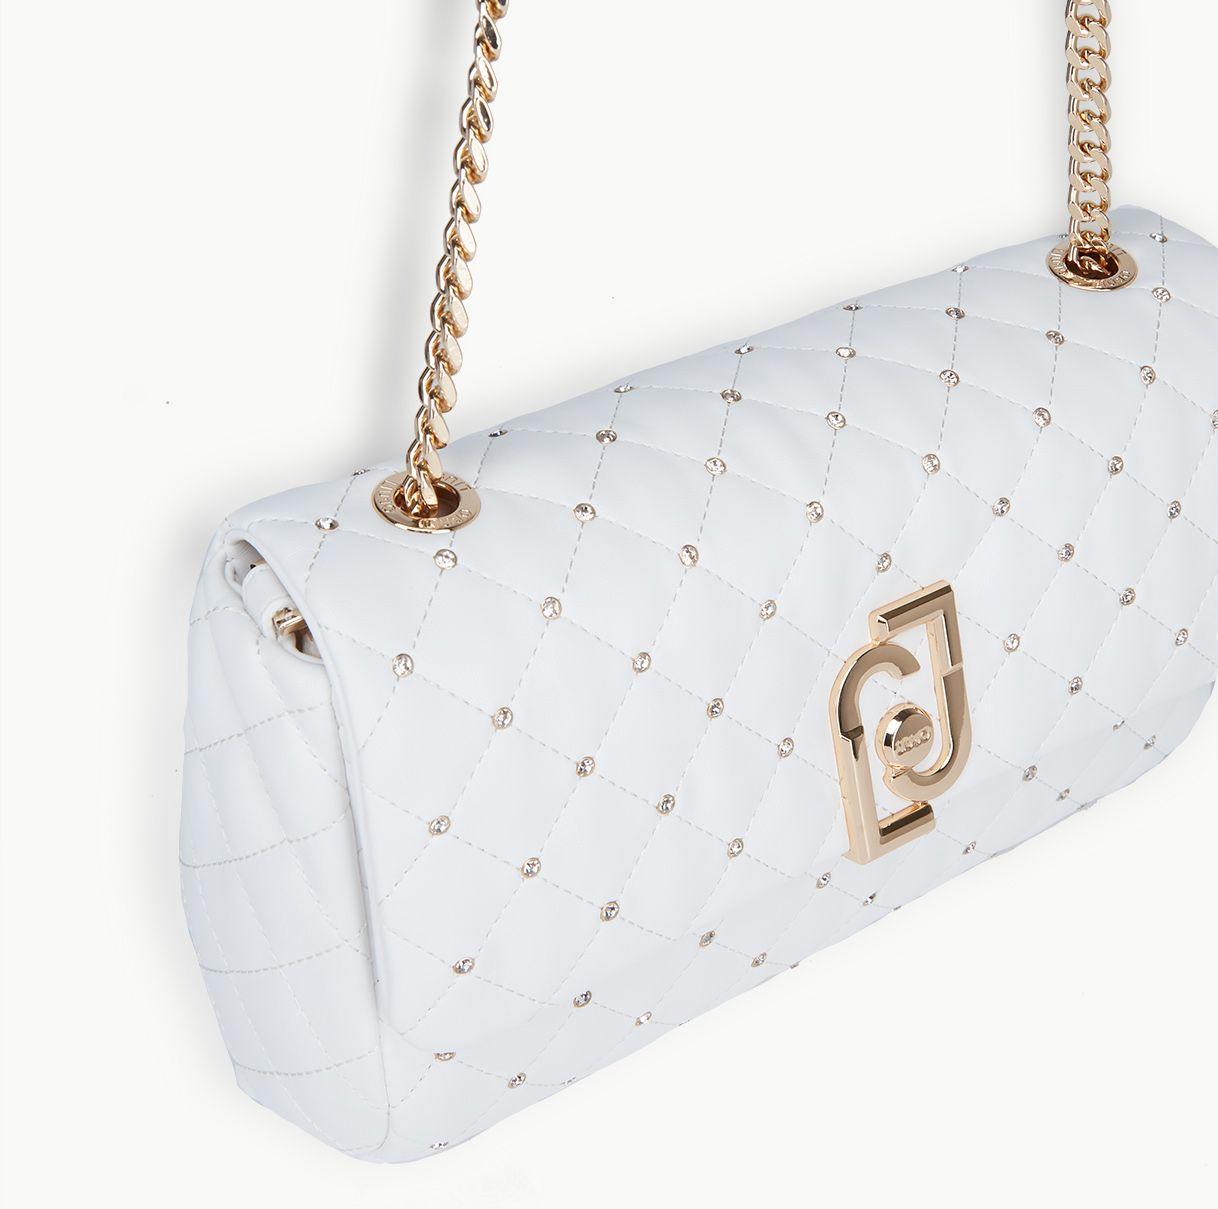 LIU JO Borsa Spot Natale IT BAG AA0211 Bianco Lana - Bagsabout